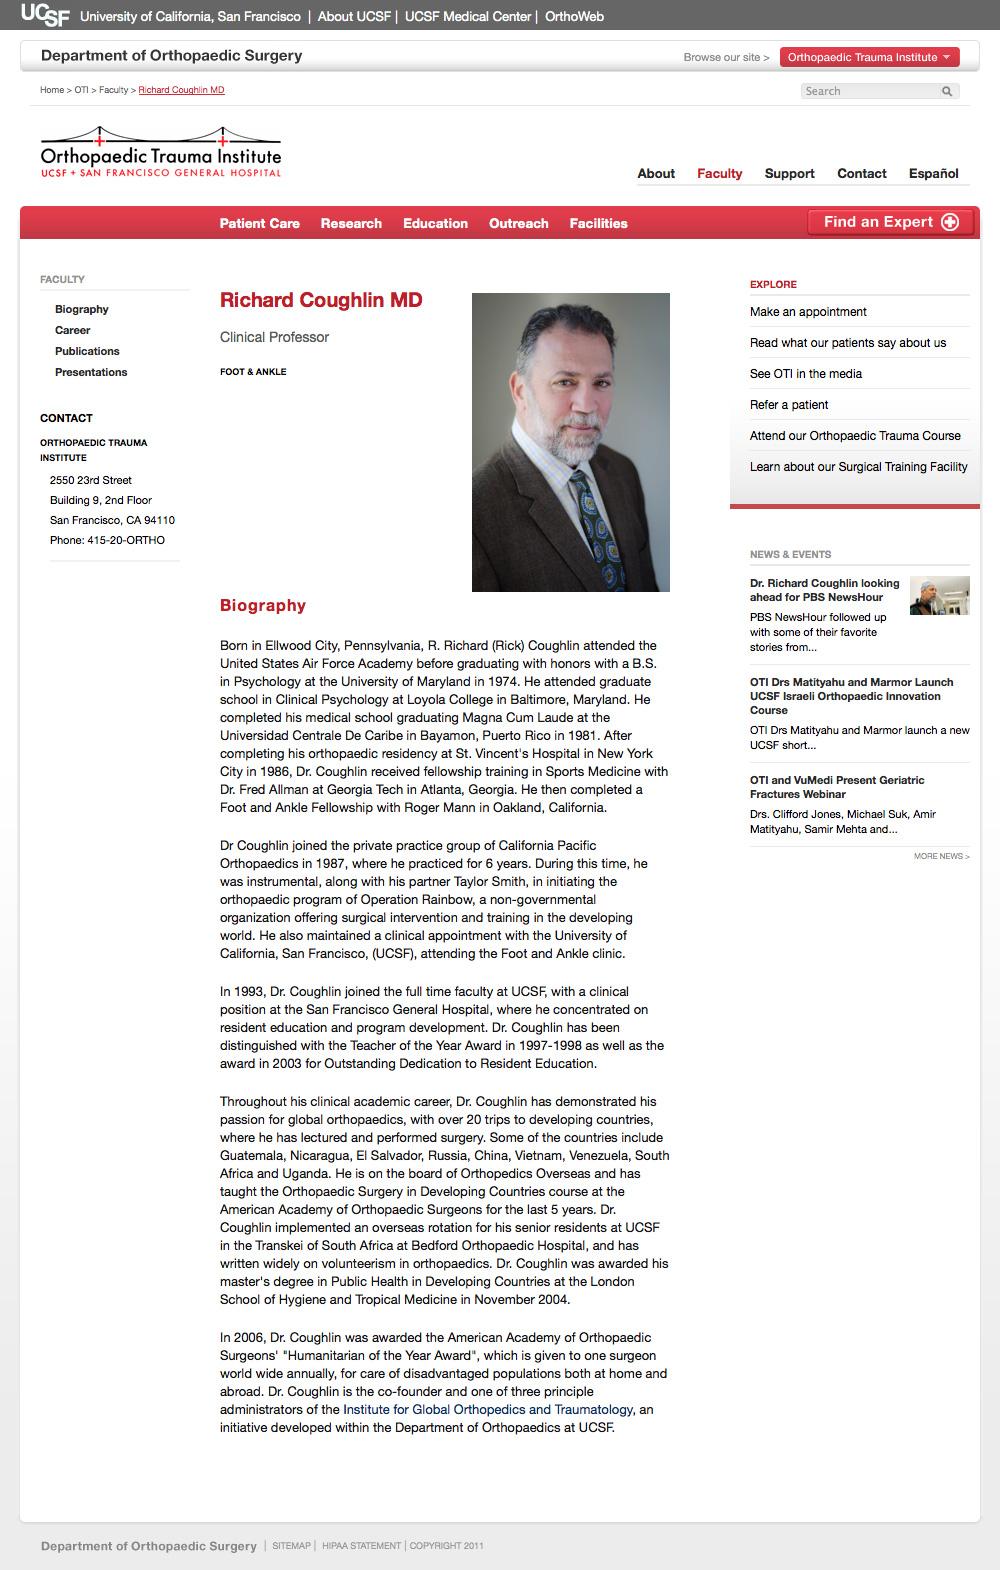 UCSF Dept of Orthopaedic Surgery, Website Design — Parker Moore Design